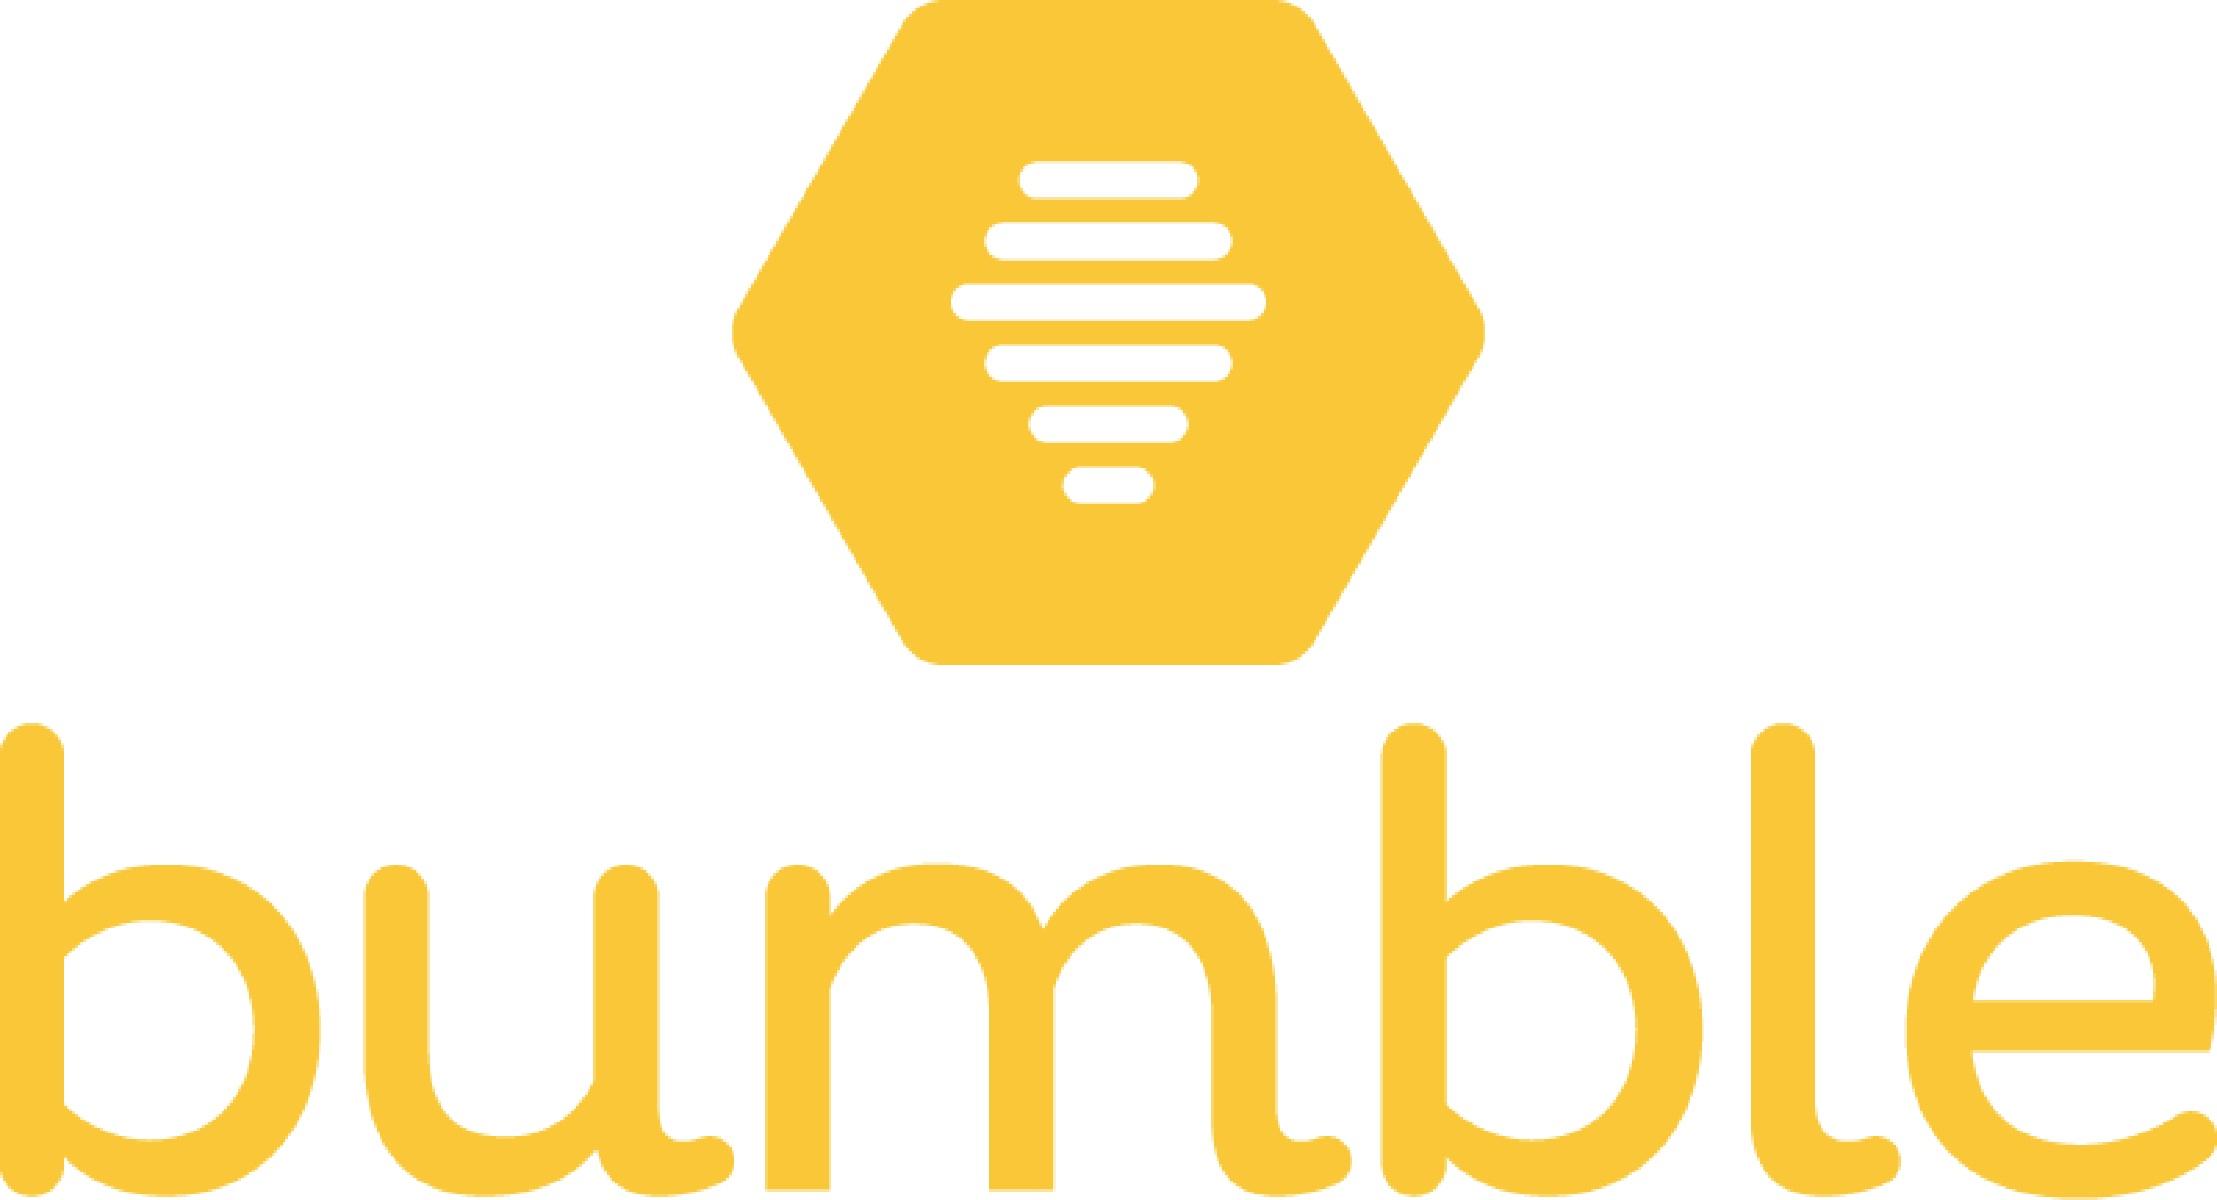 Bumble Review September 2019 - Women empowerment or plain